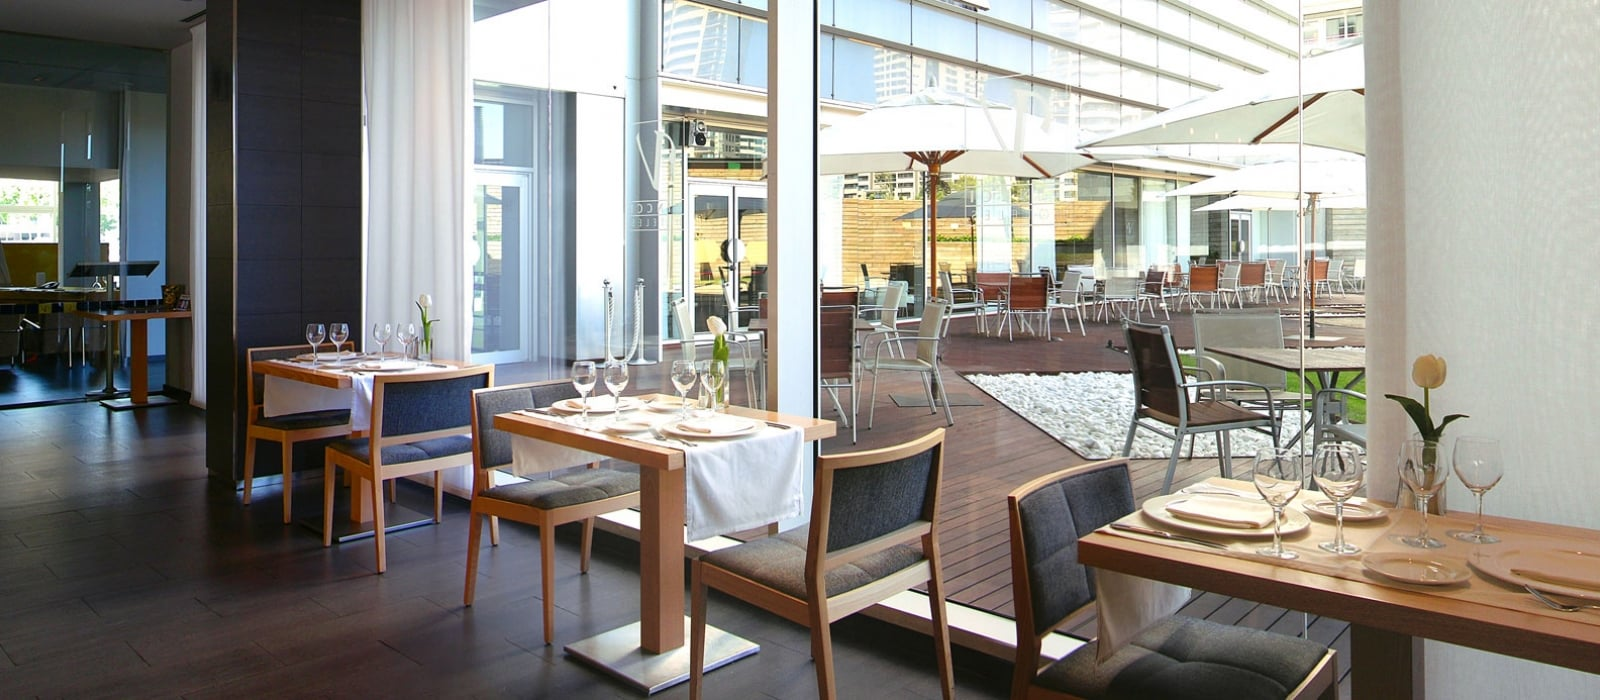 Restaurant Hotel Barcelona Marítimo - Vincci Hotels - Jardí de Mar